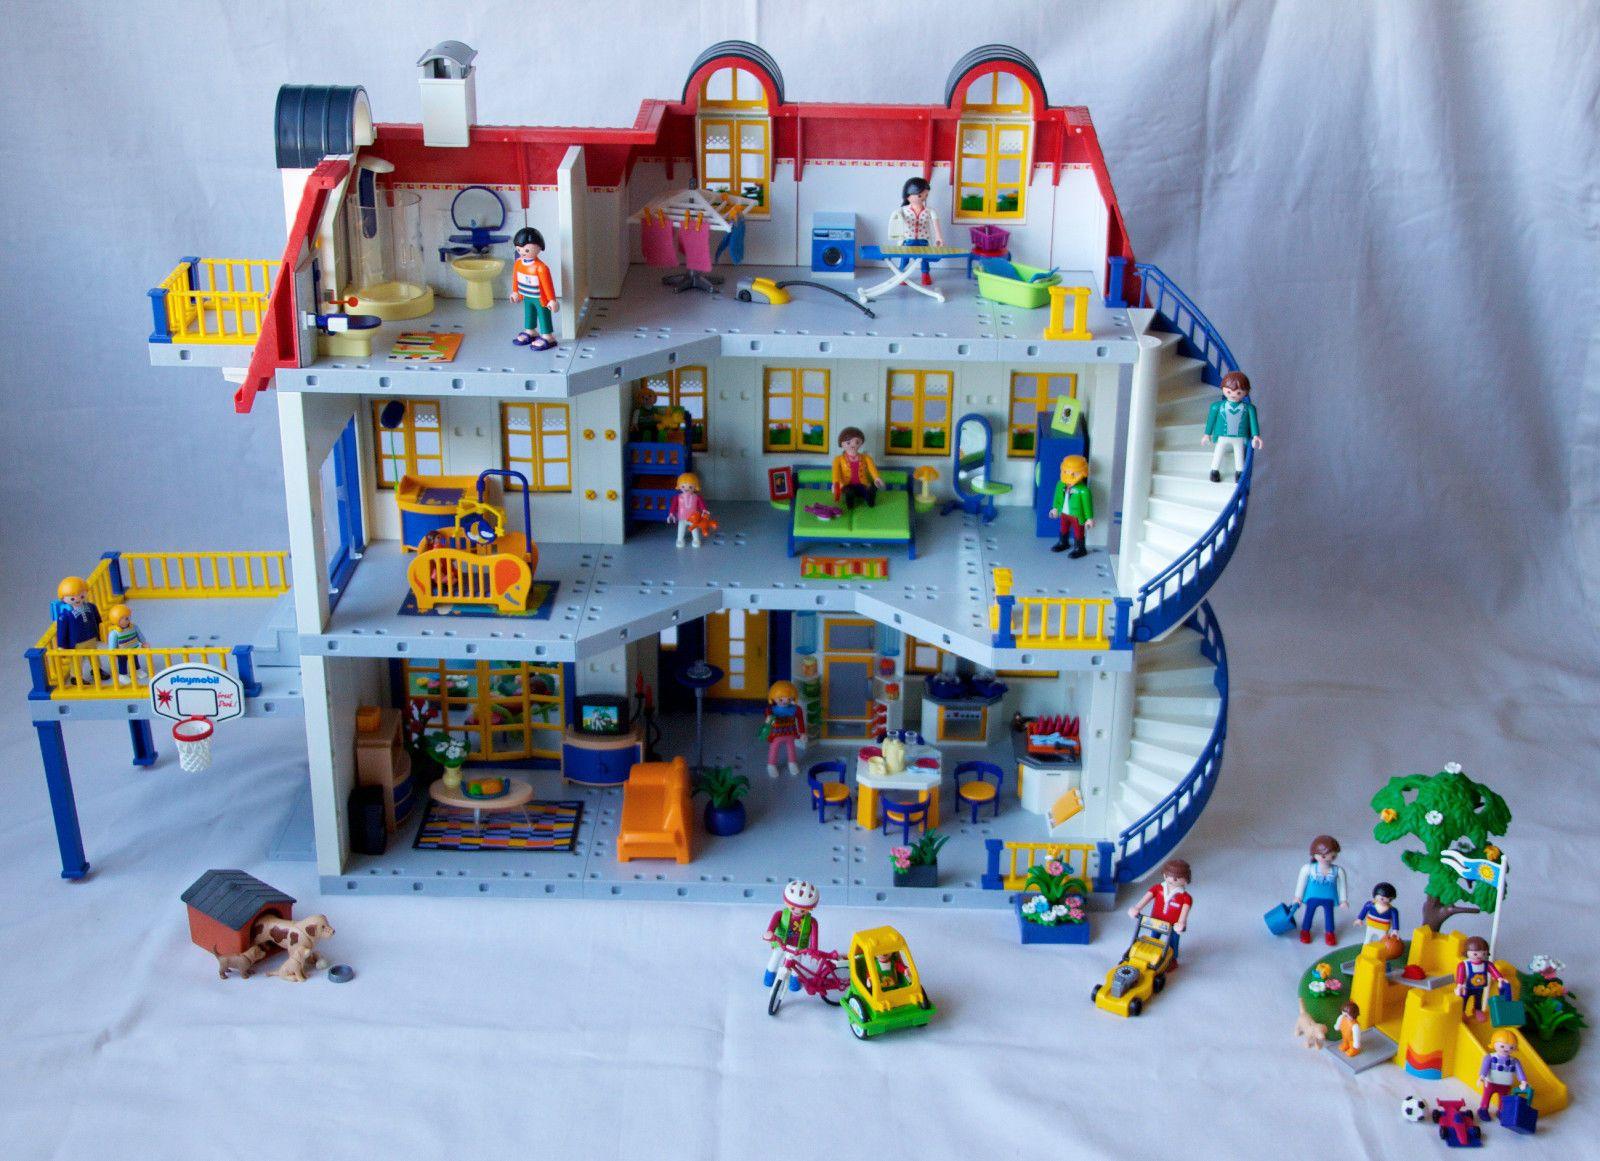 Playmobil 3965 modern house extension floor 7337 sets 3235 for Casa moderna de playmobil 123